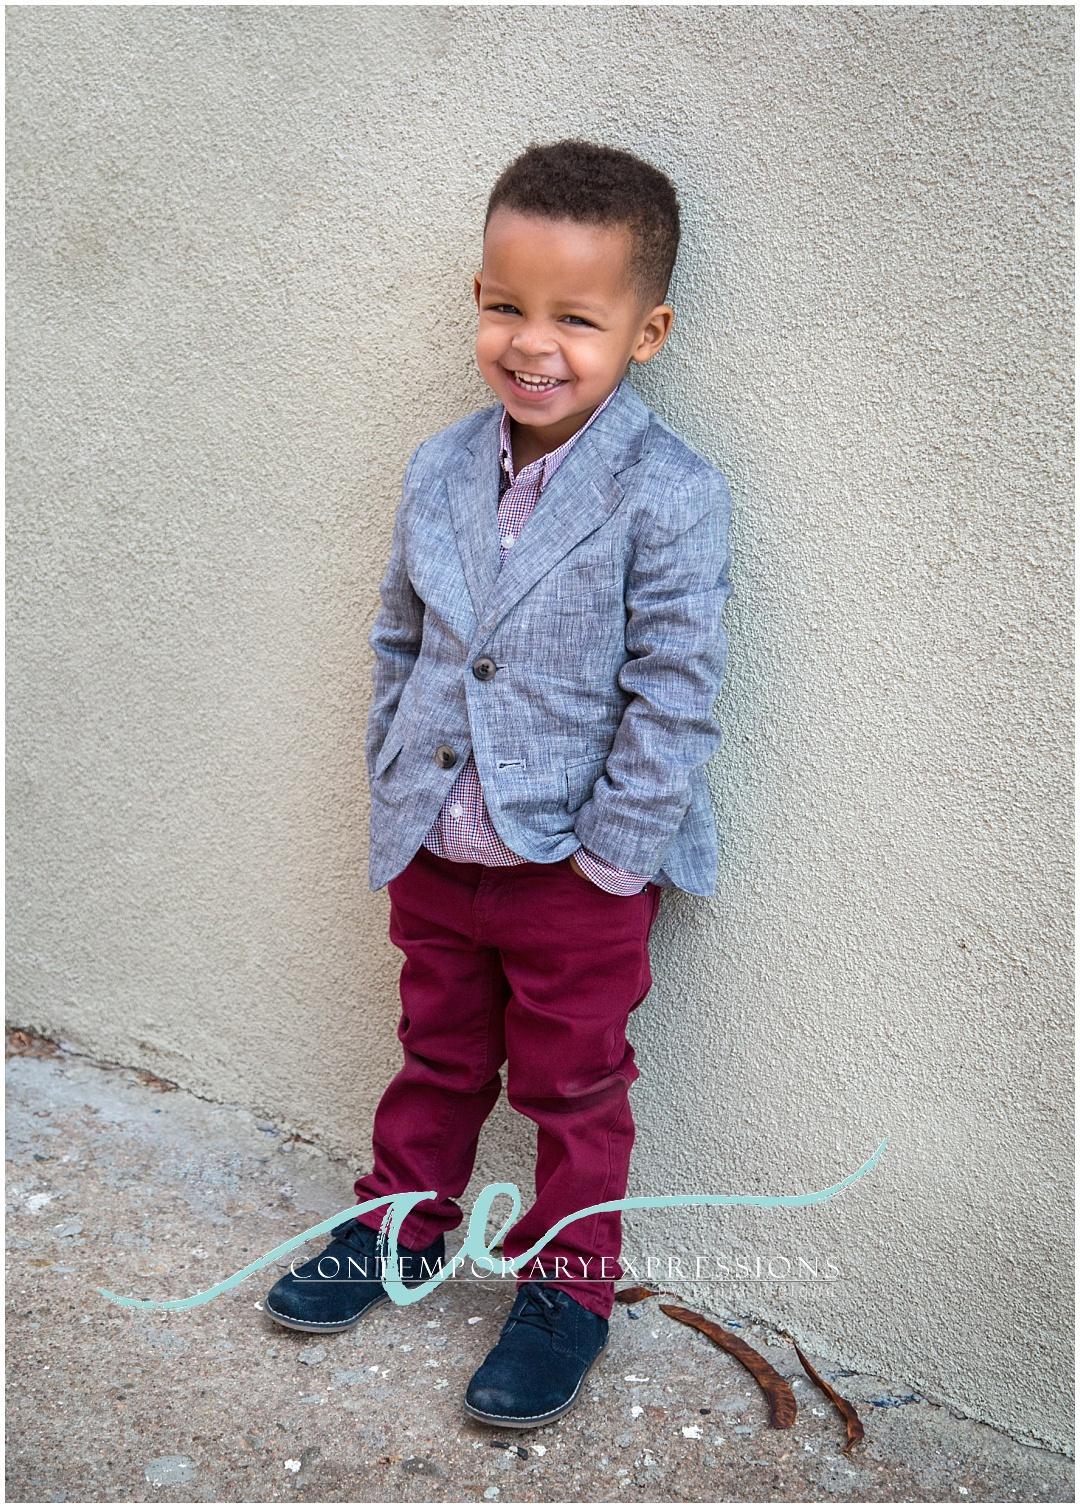 denverfamilyphotography-denverphotographer-denverfamilyphotography-familyphotography-family-photos